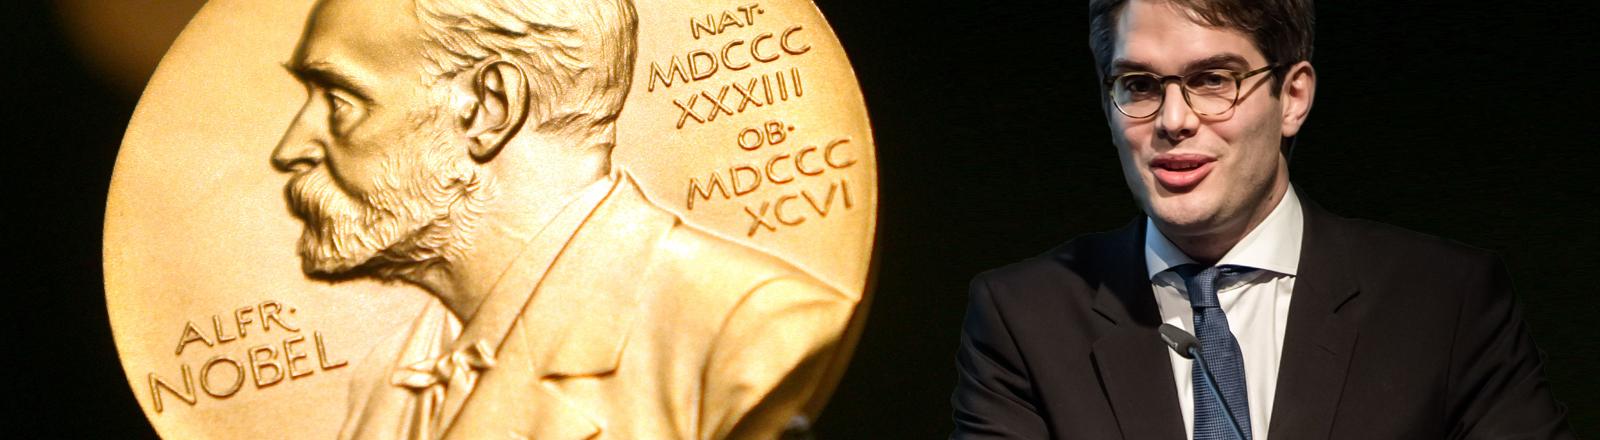 Medizinhistoriker Nils Hansson vor der Nobelpreis-Medaille.